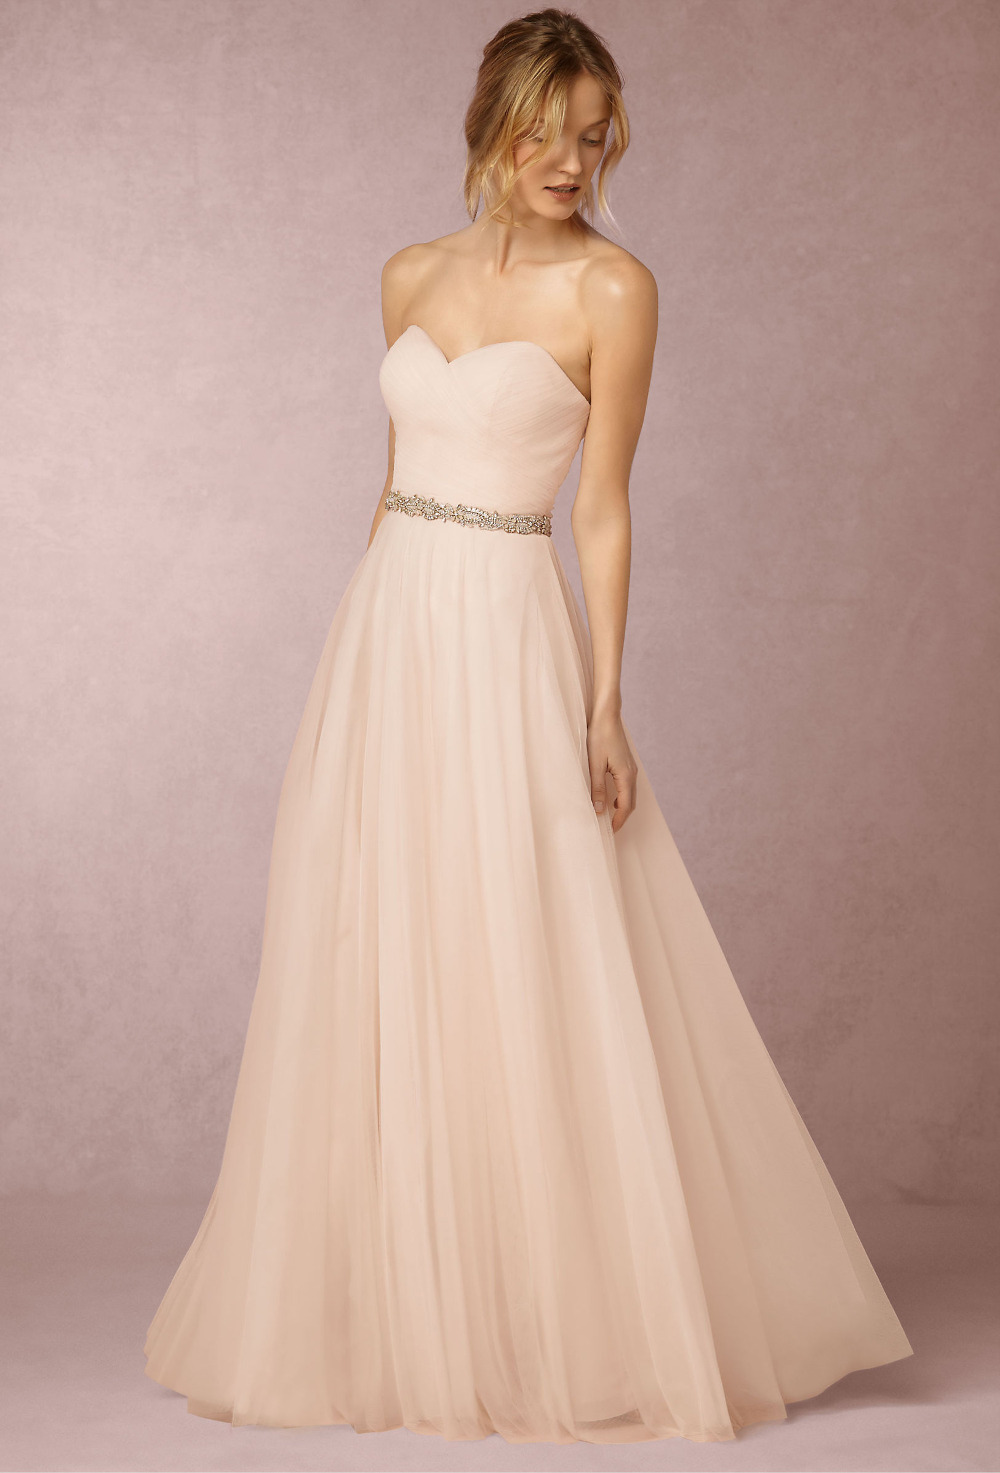 wedding dresses under 600 photo - 1